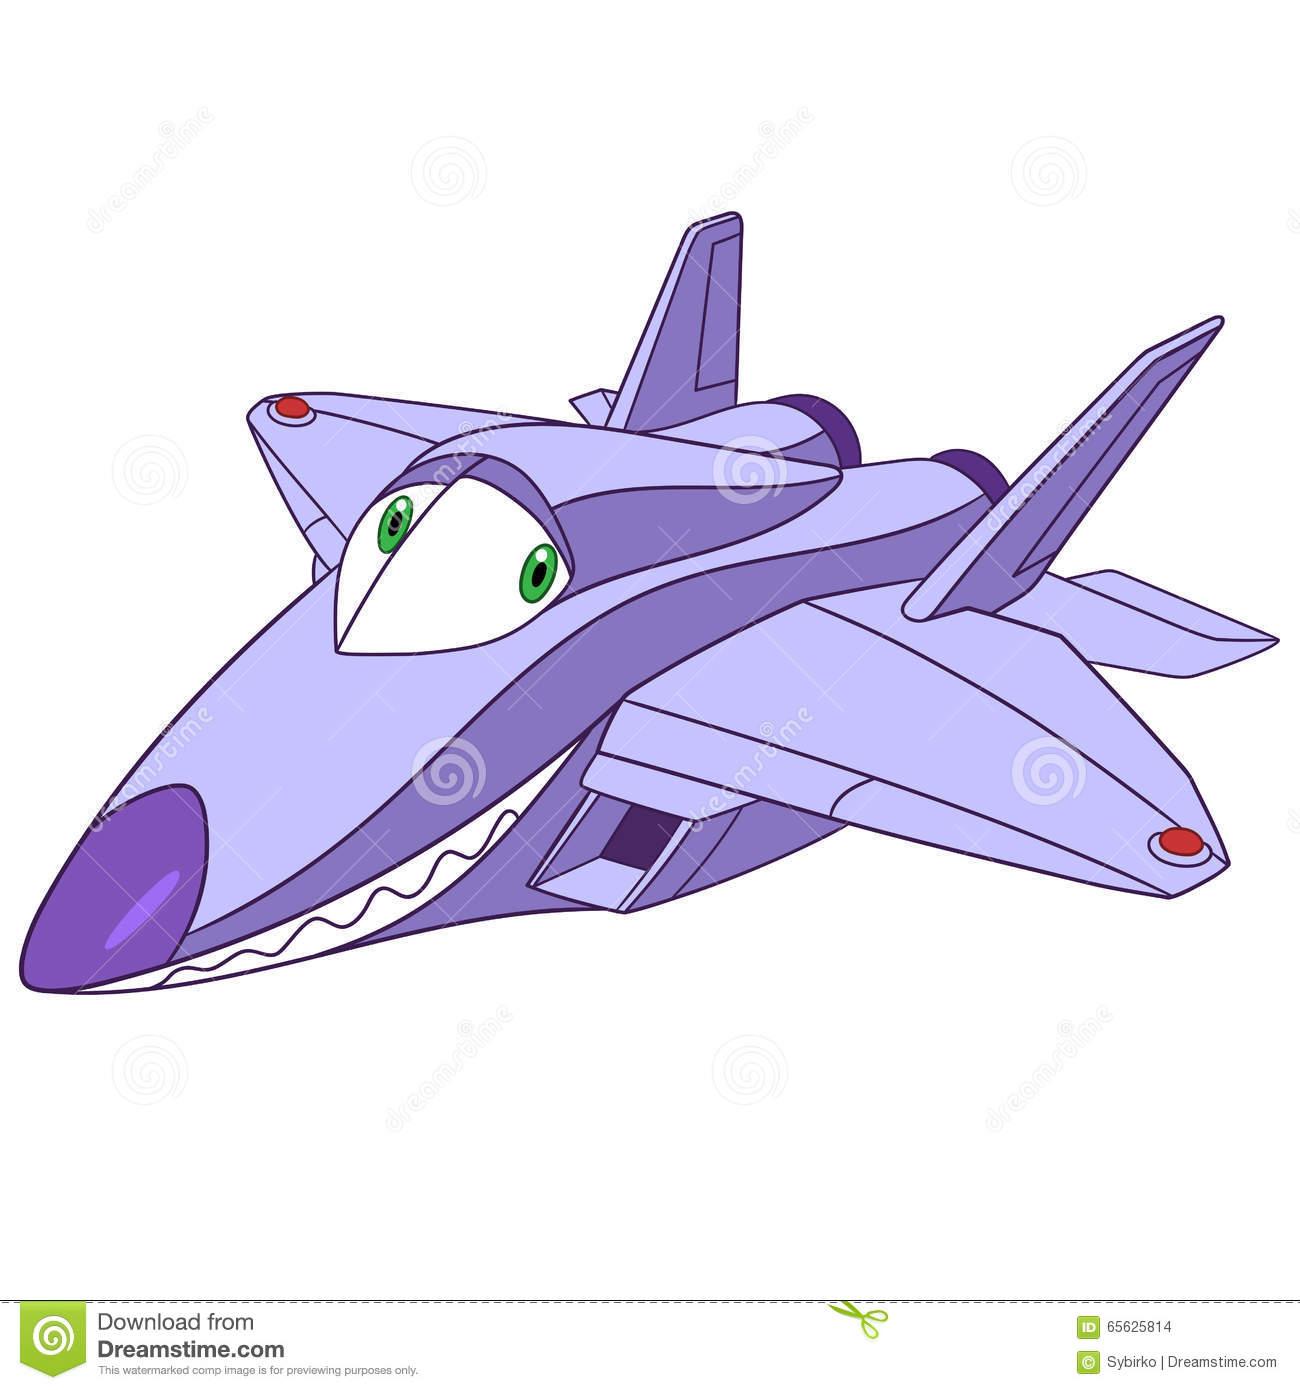 Raptor Plane Clipart.